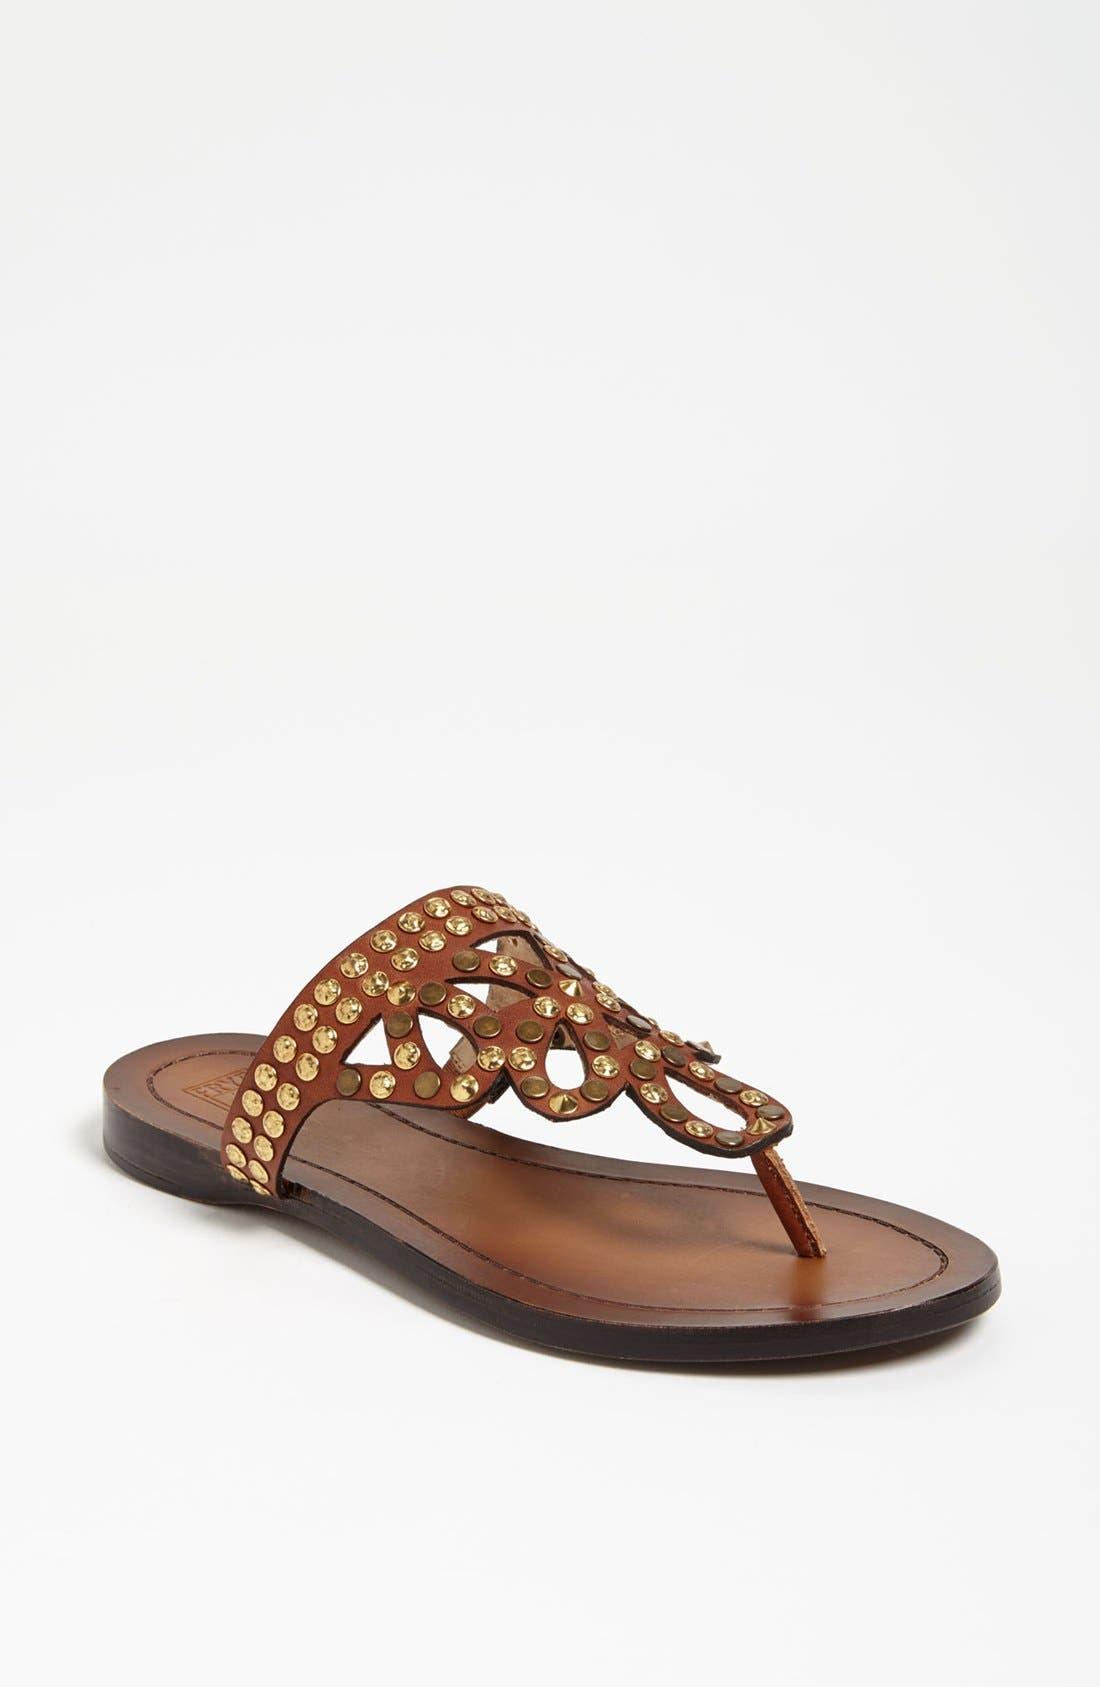 Alternate Image 1 Selected - Frye 'Rachel' Sandal